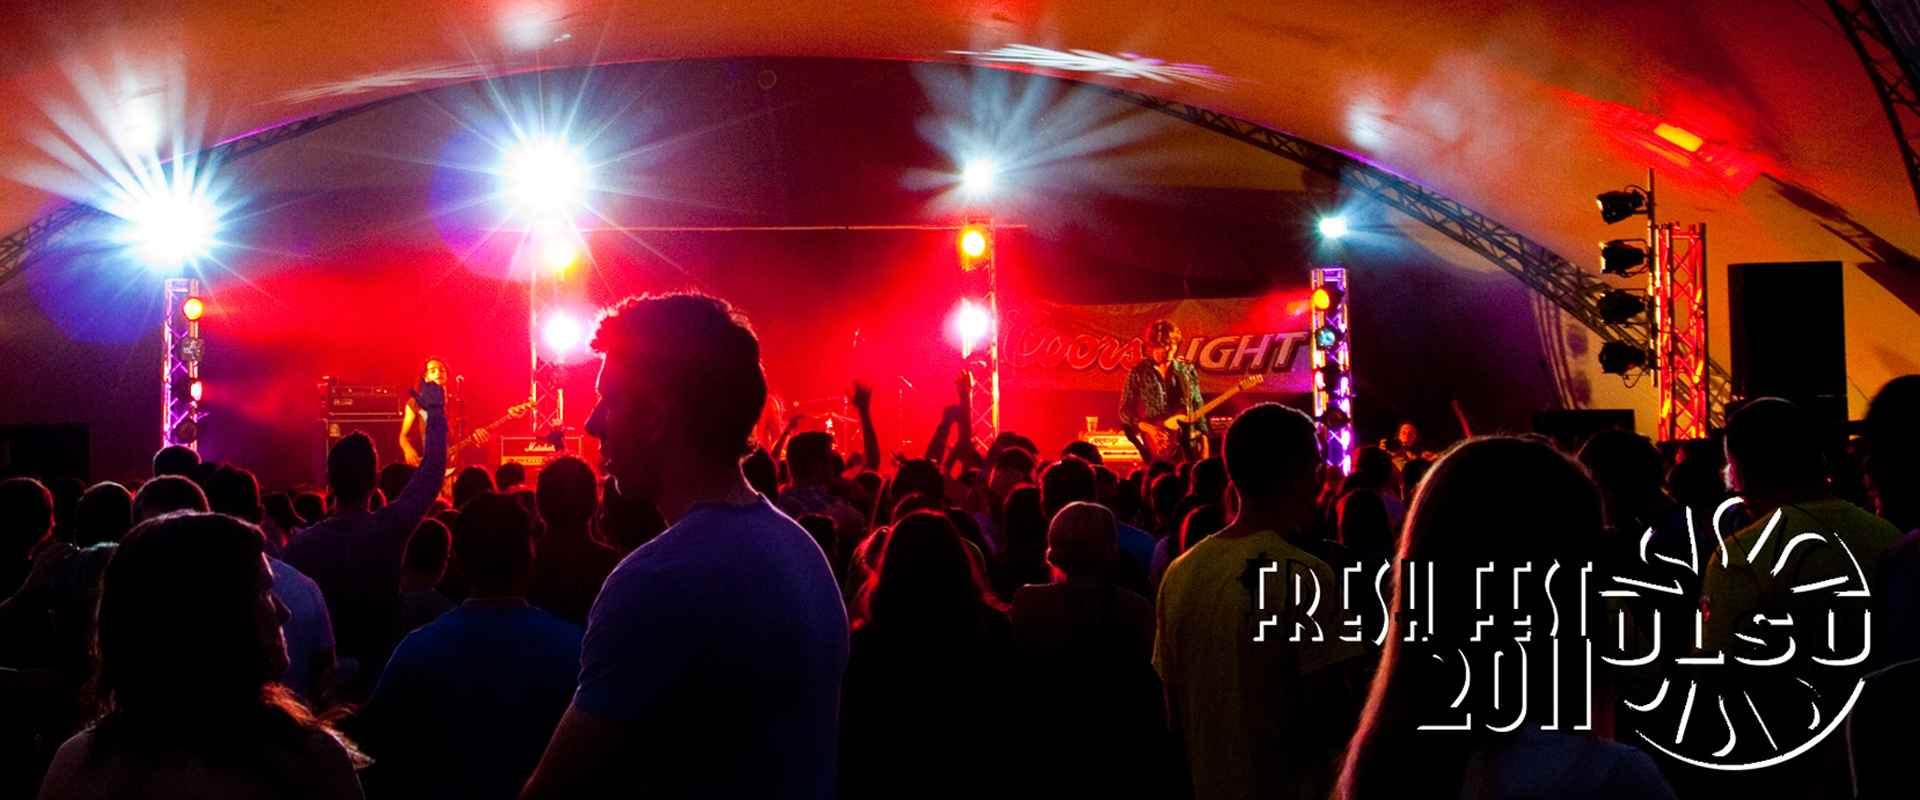 Fresh Fest Jamboree